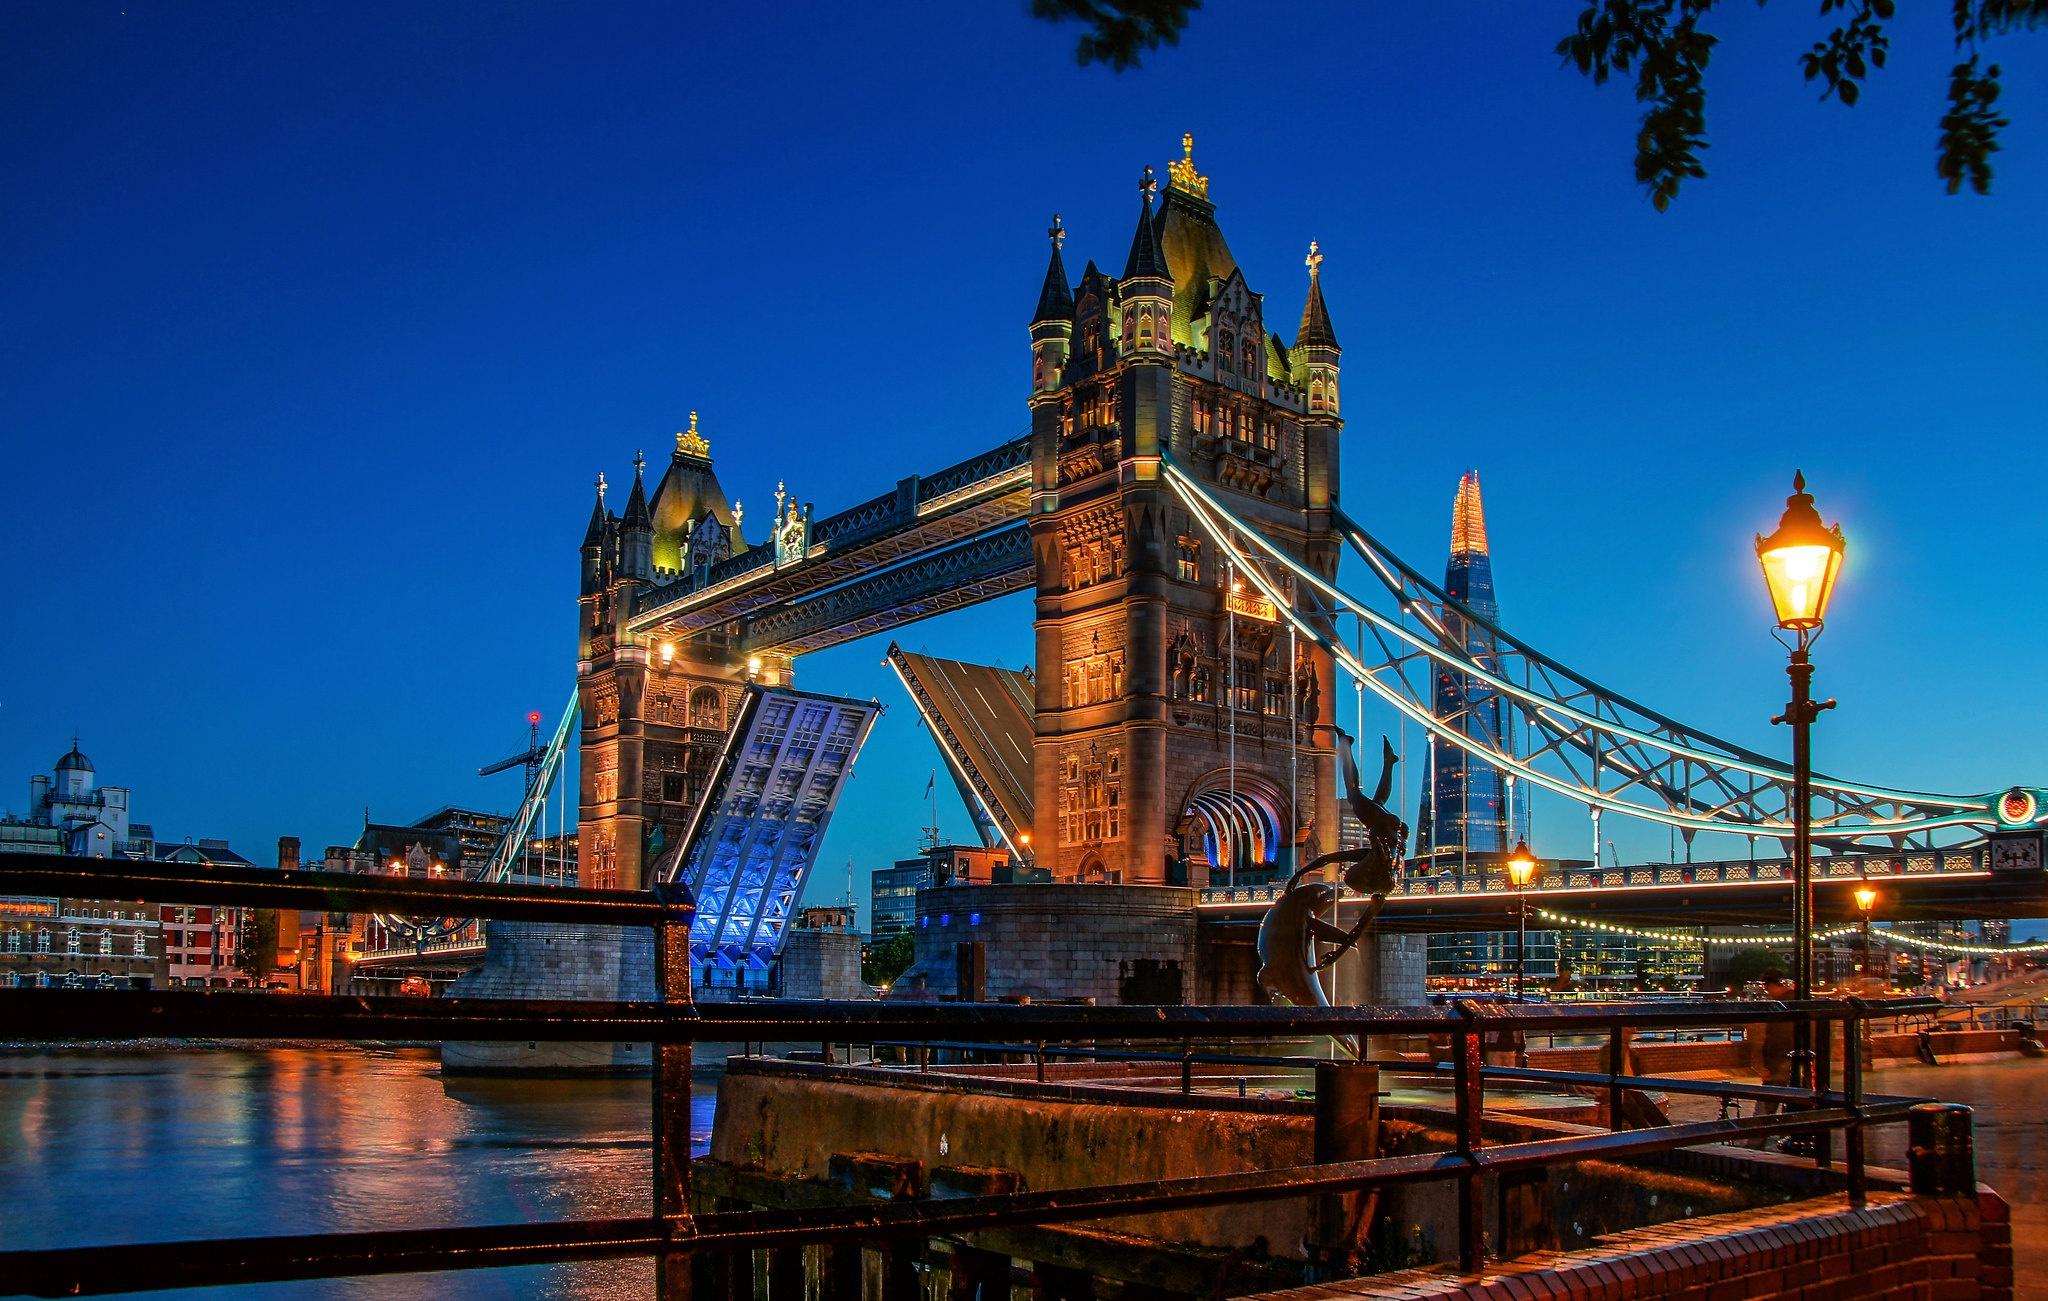 General 2048x1301 London bridge Tower Bridge city cityscape UK dusk